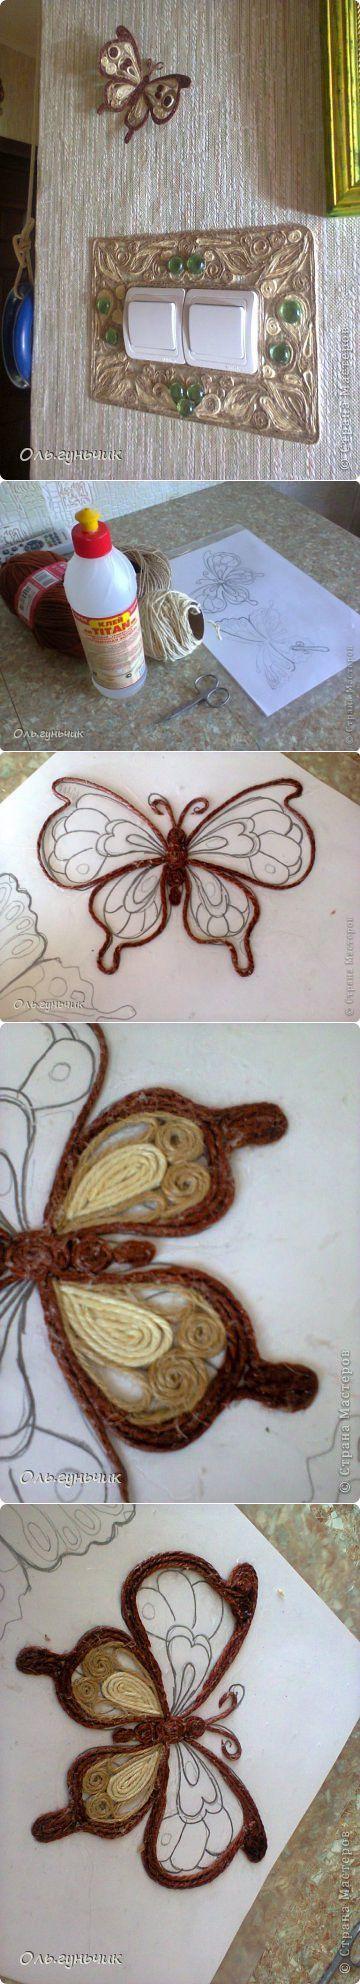 MK mariposa afiligranada